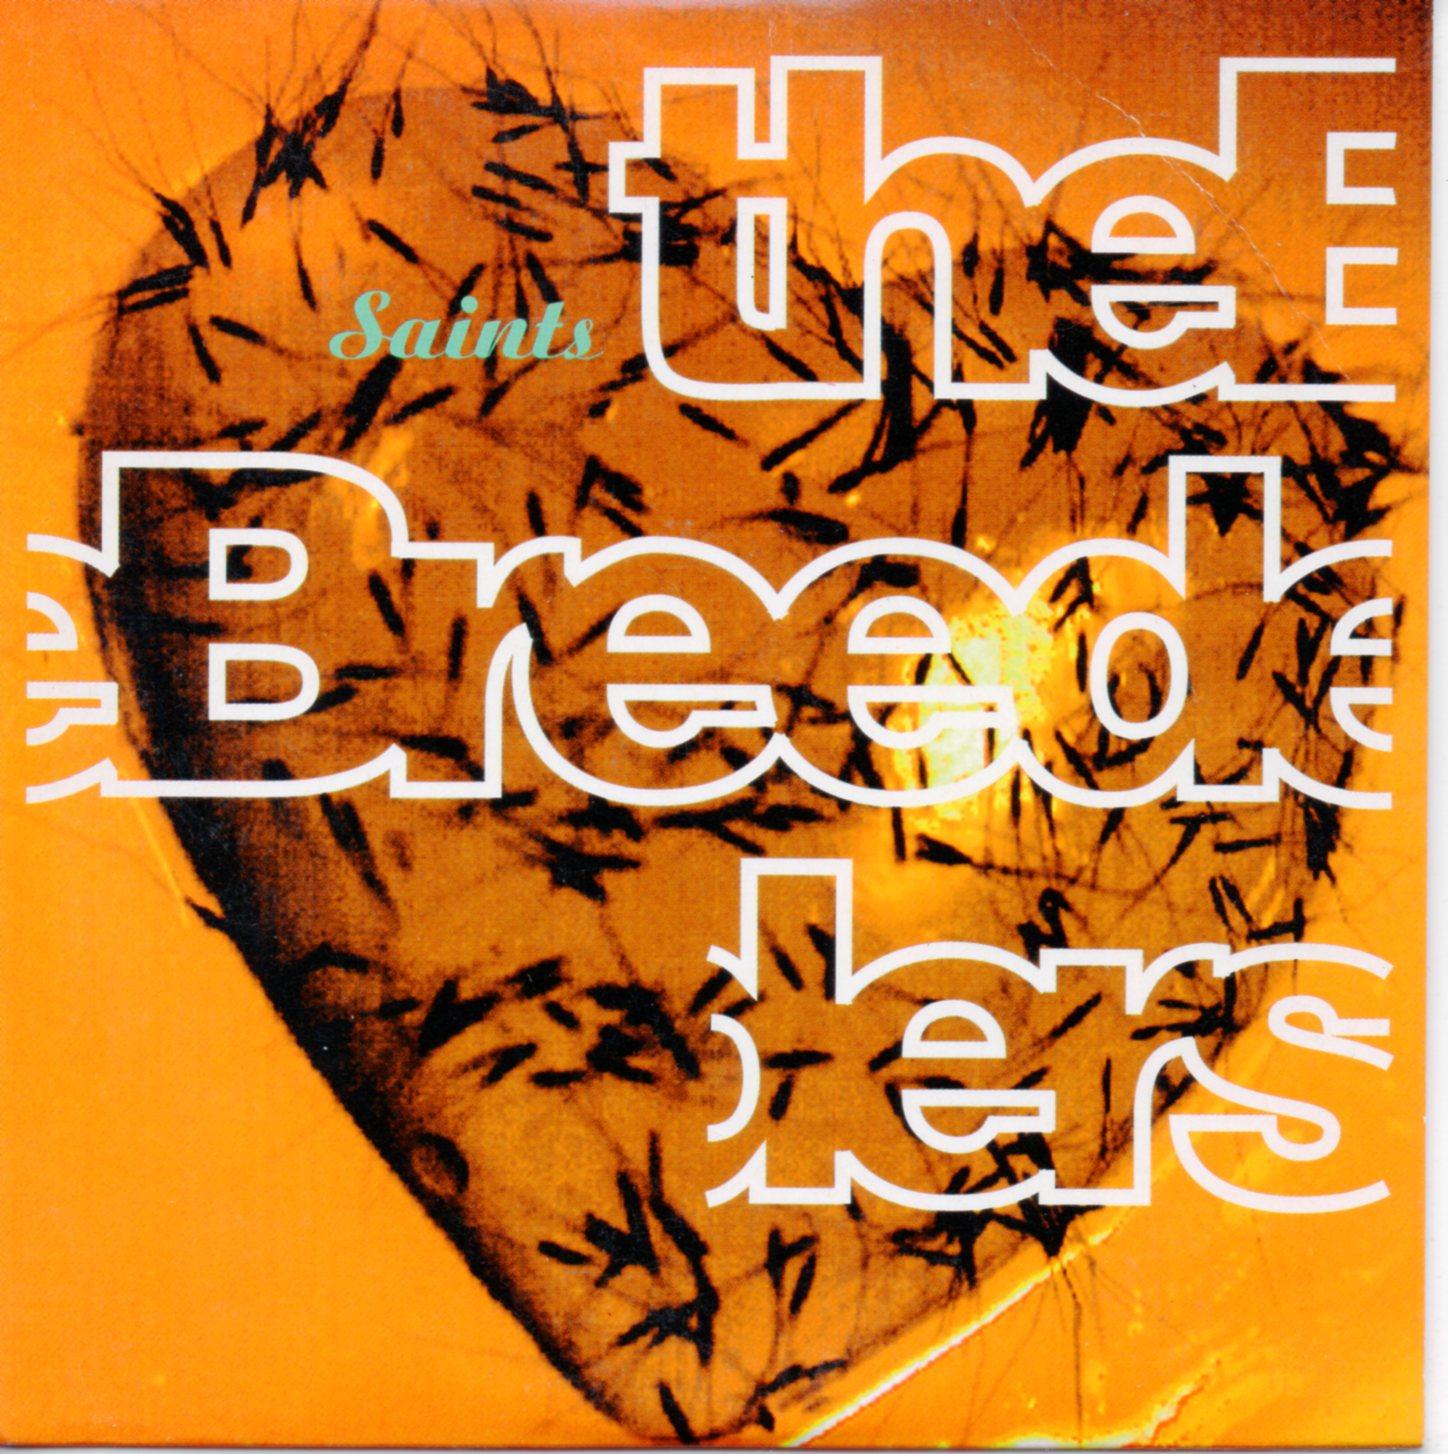 THE BREEDERS - Saints - 2-track CARD SLEEVE - CD single